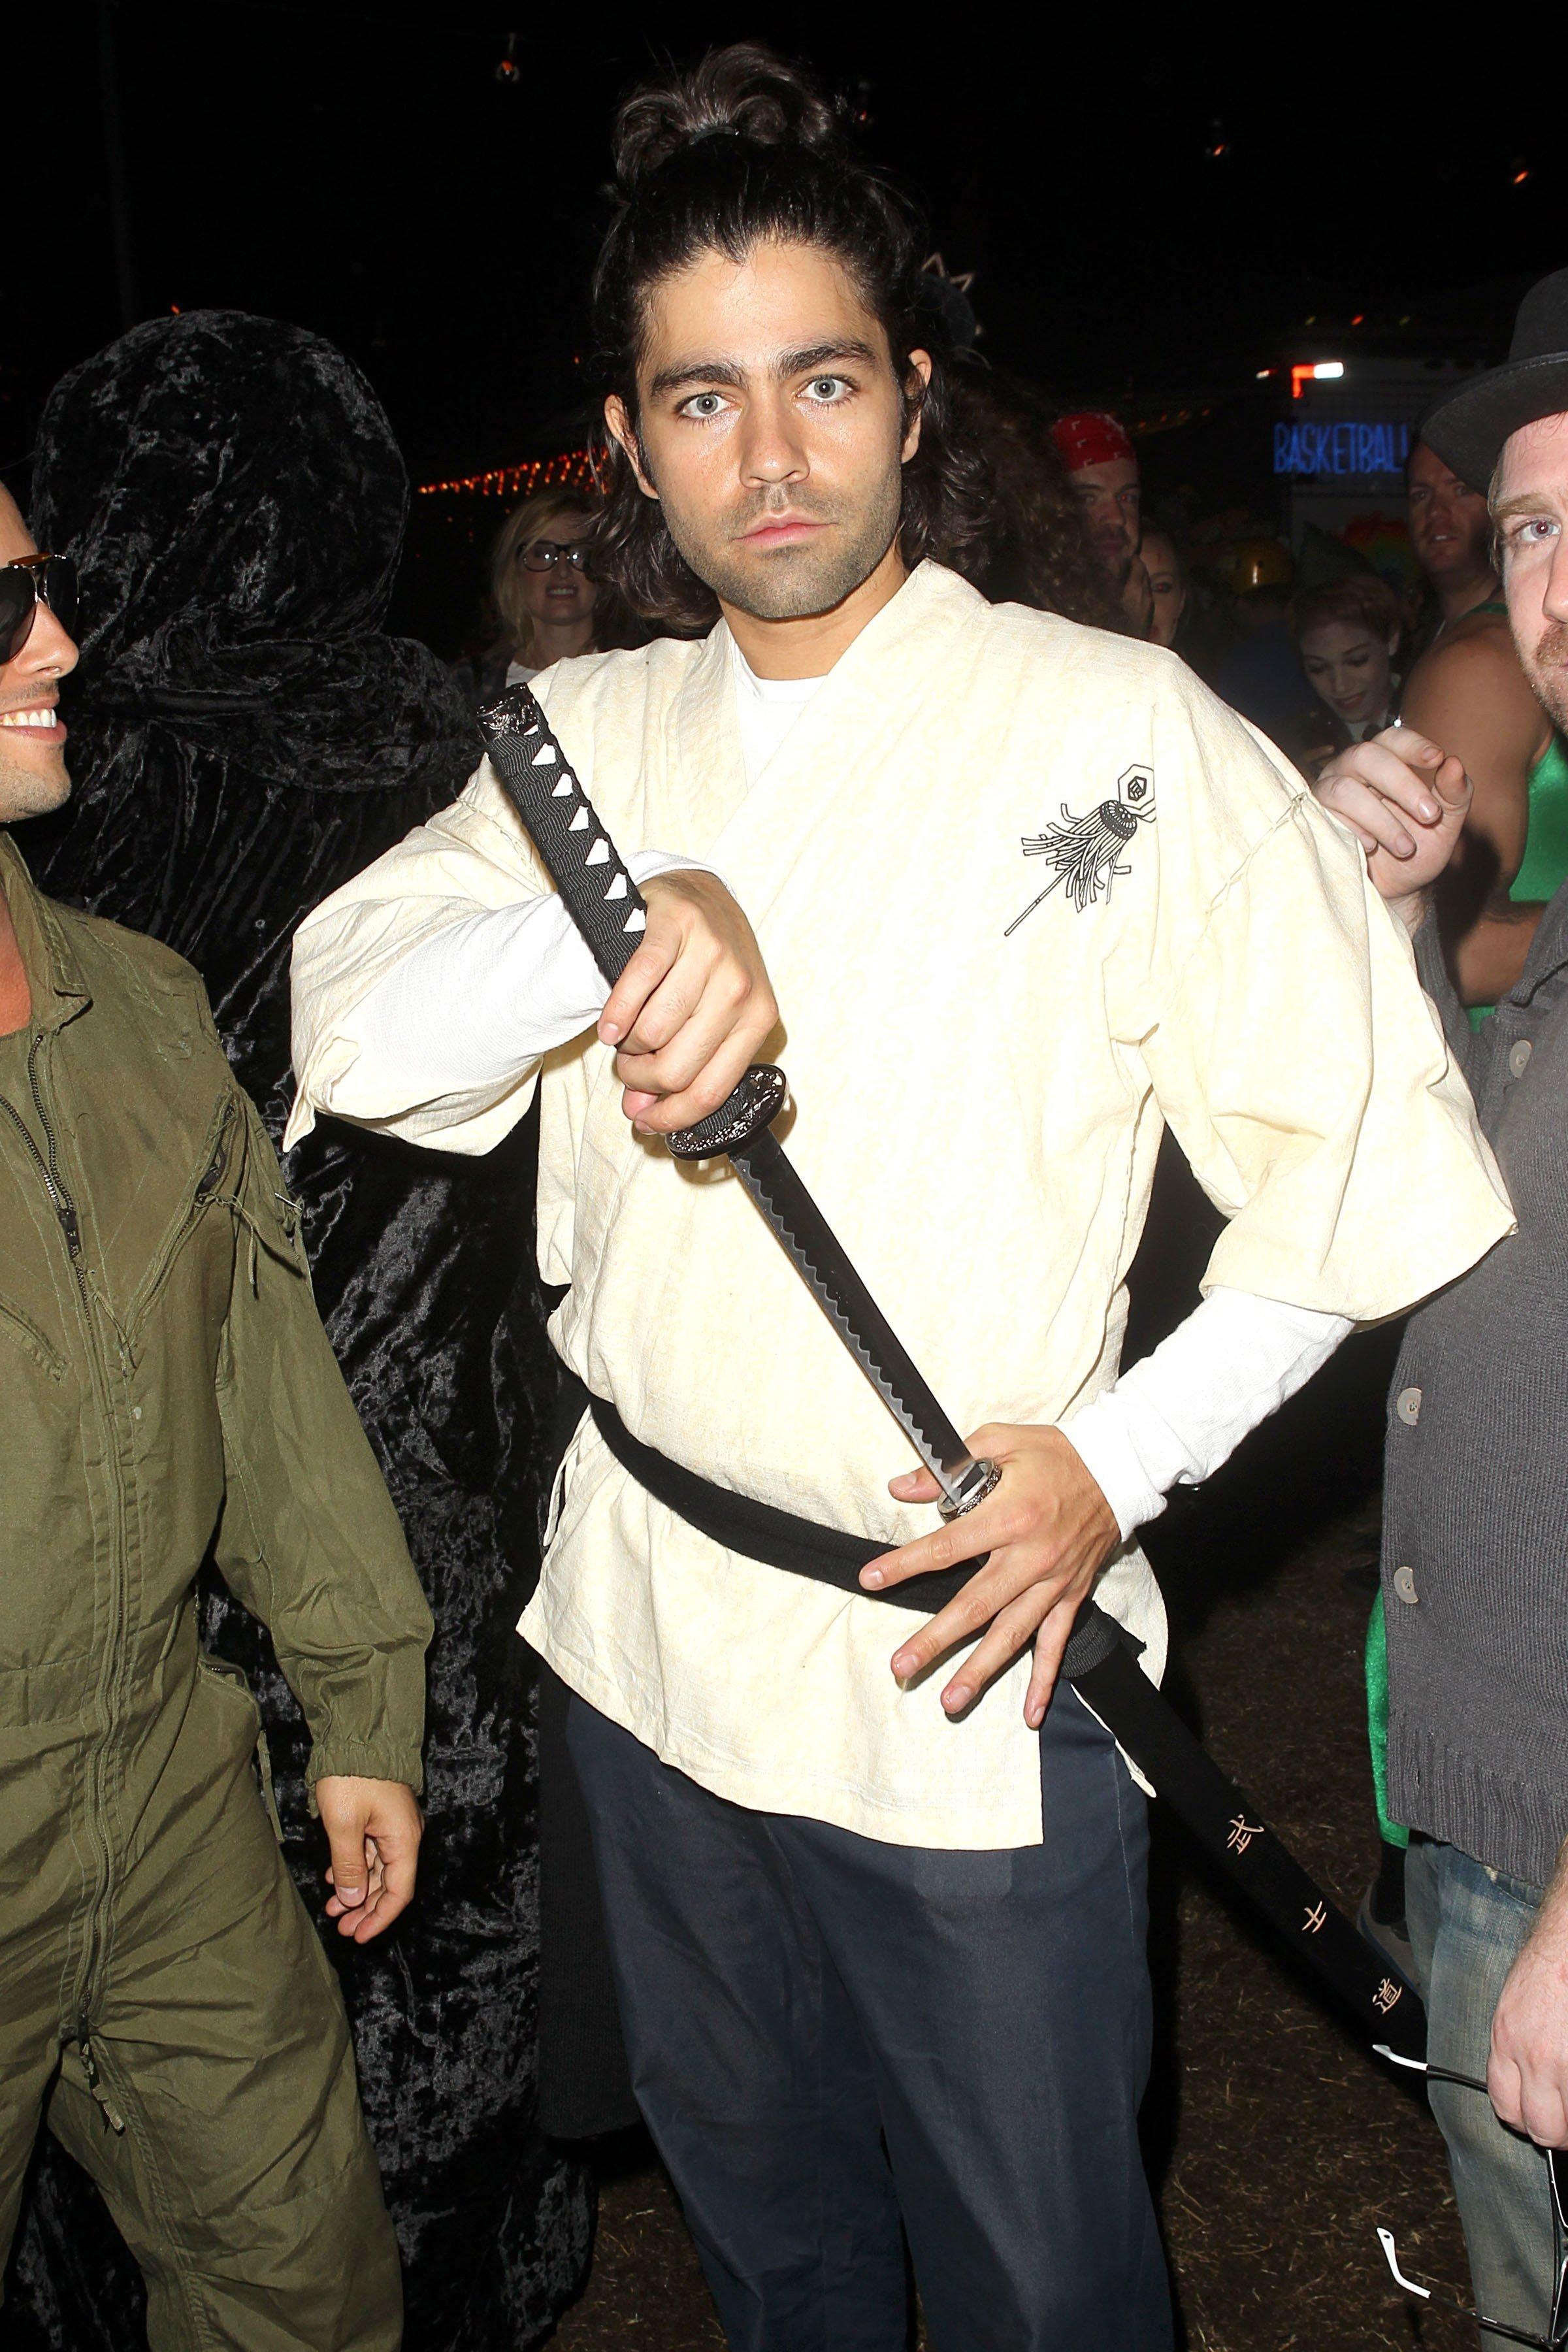 10 Most Popular Last Minute Costume Ideas For Men 18 last minute celebrity halloween costumes that werent half bad 6 2020